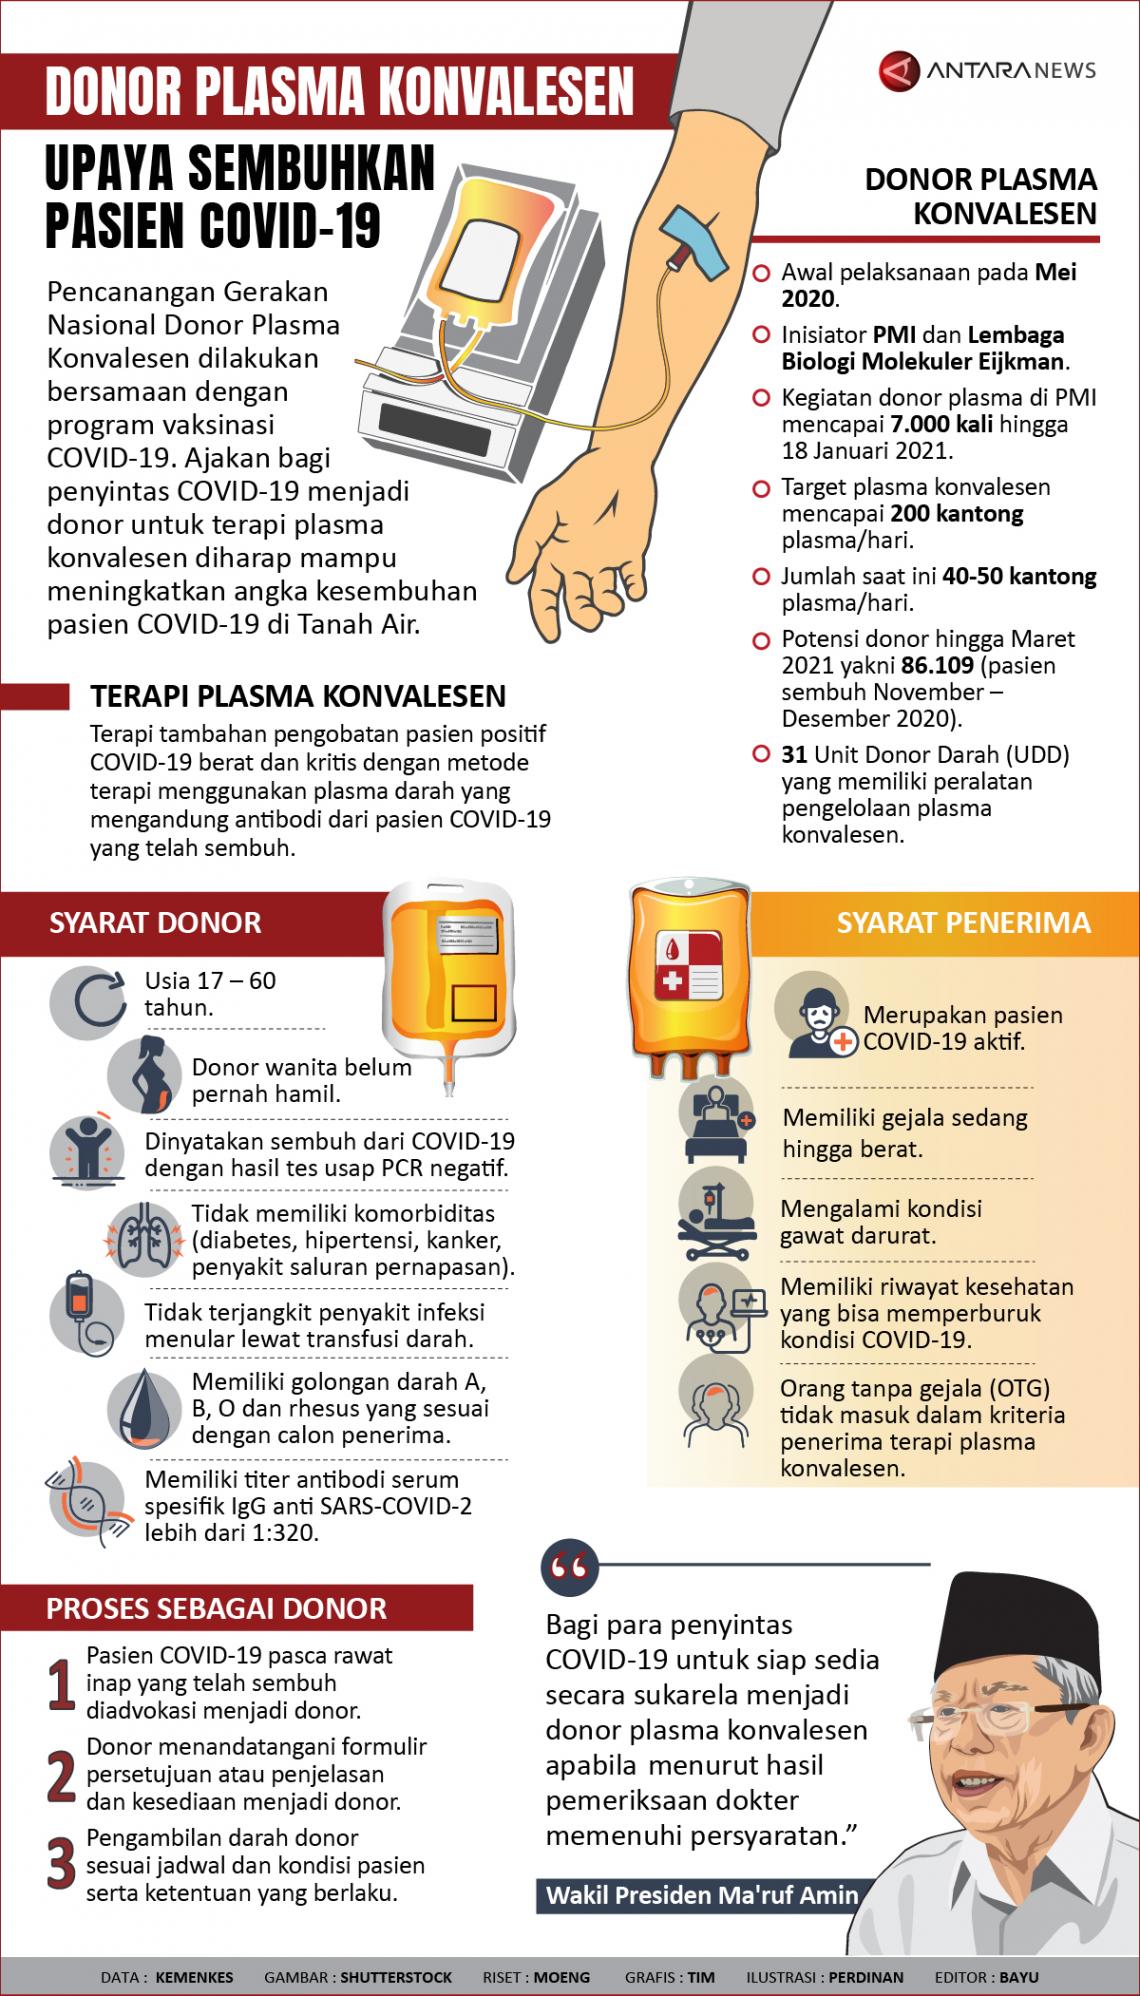 Donor plasma konvaselen, upaya sembuhkan pasien COVID-19